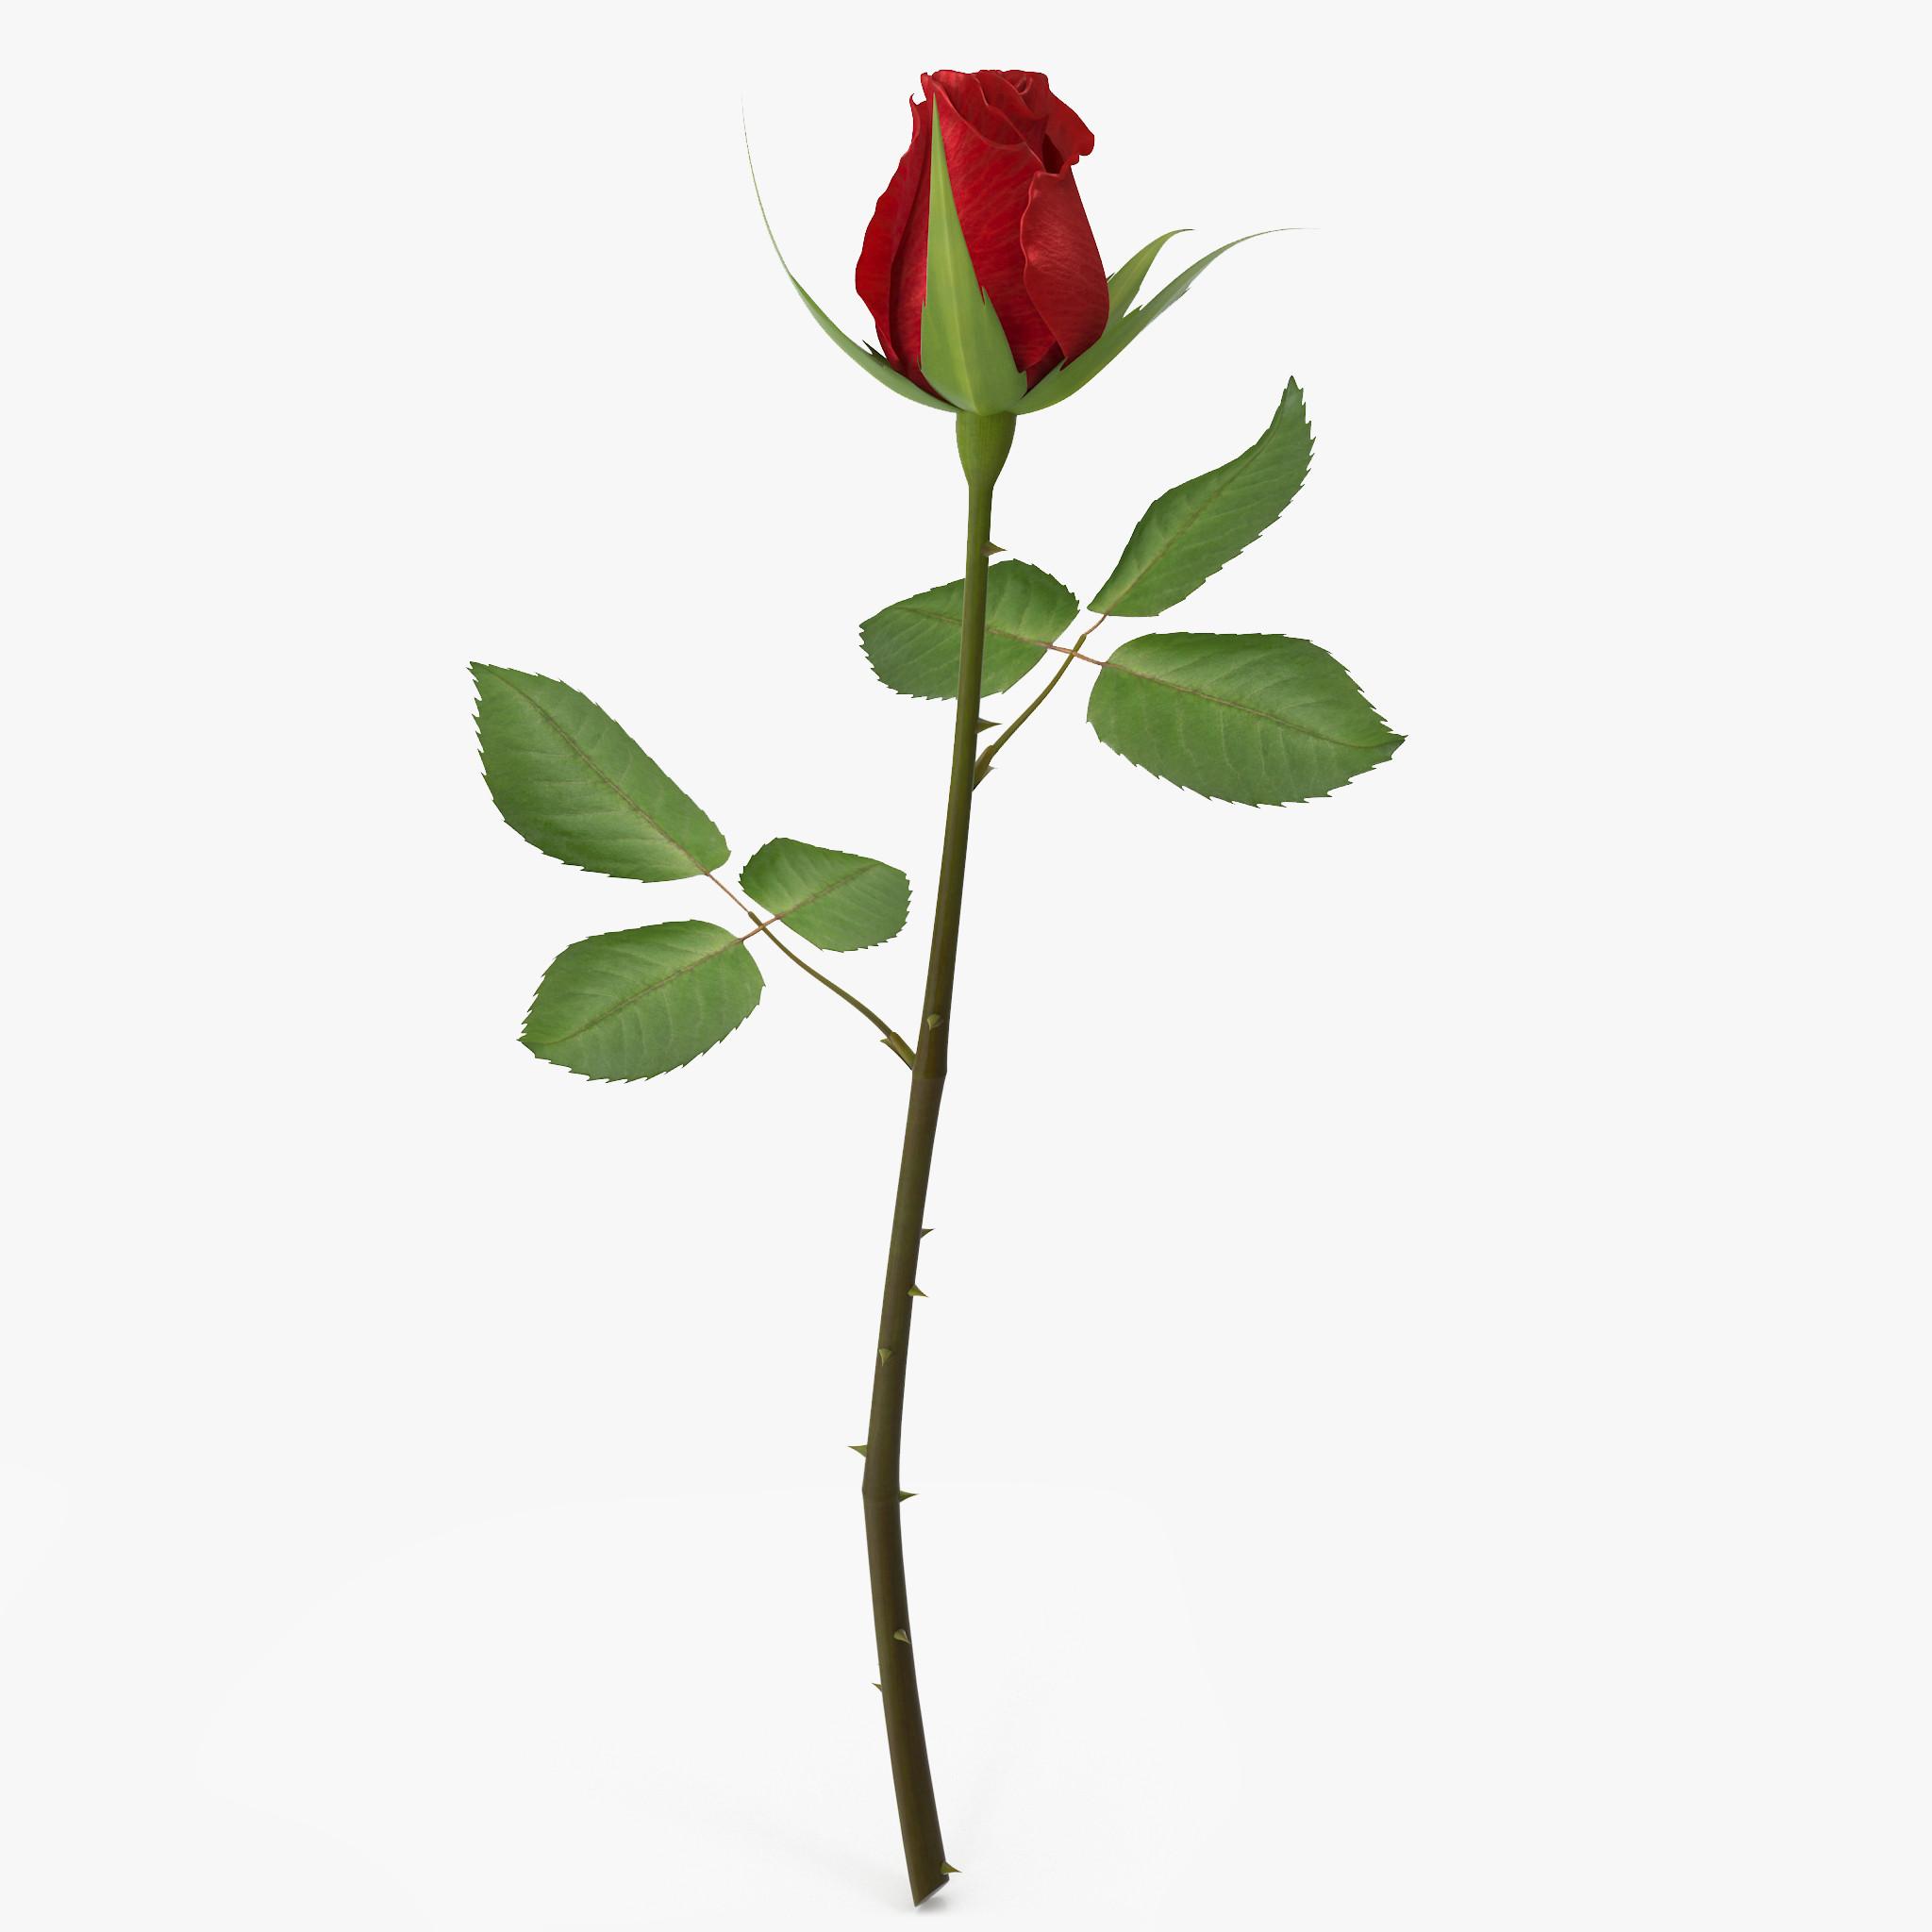 rose 7_1_1_1.jpg